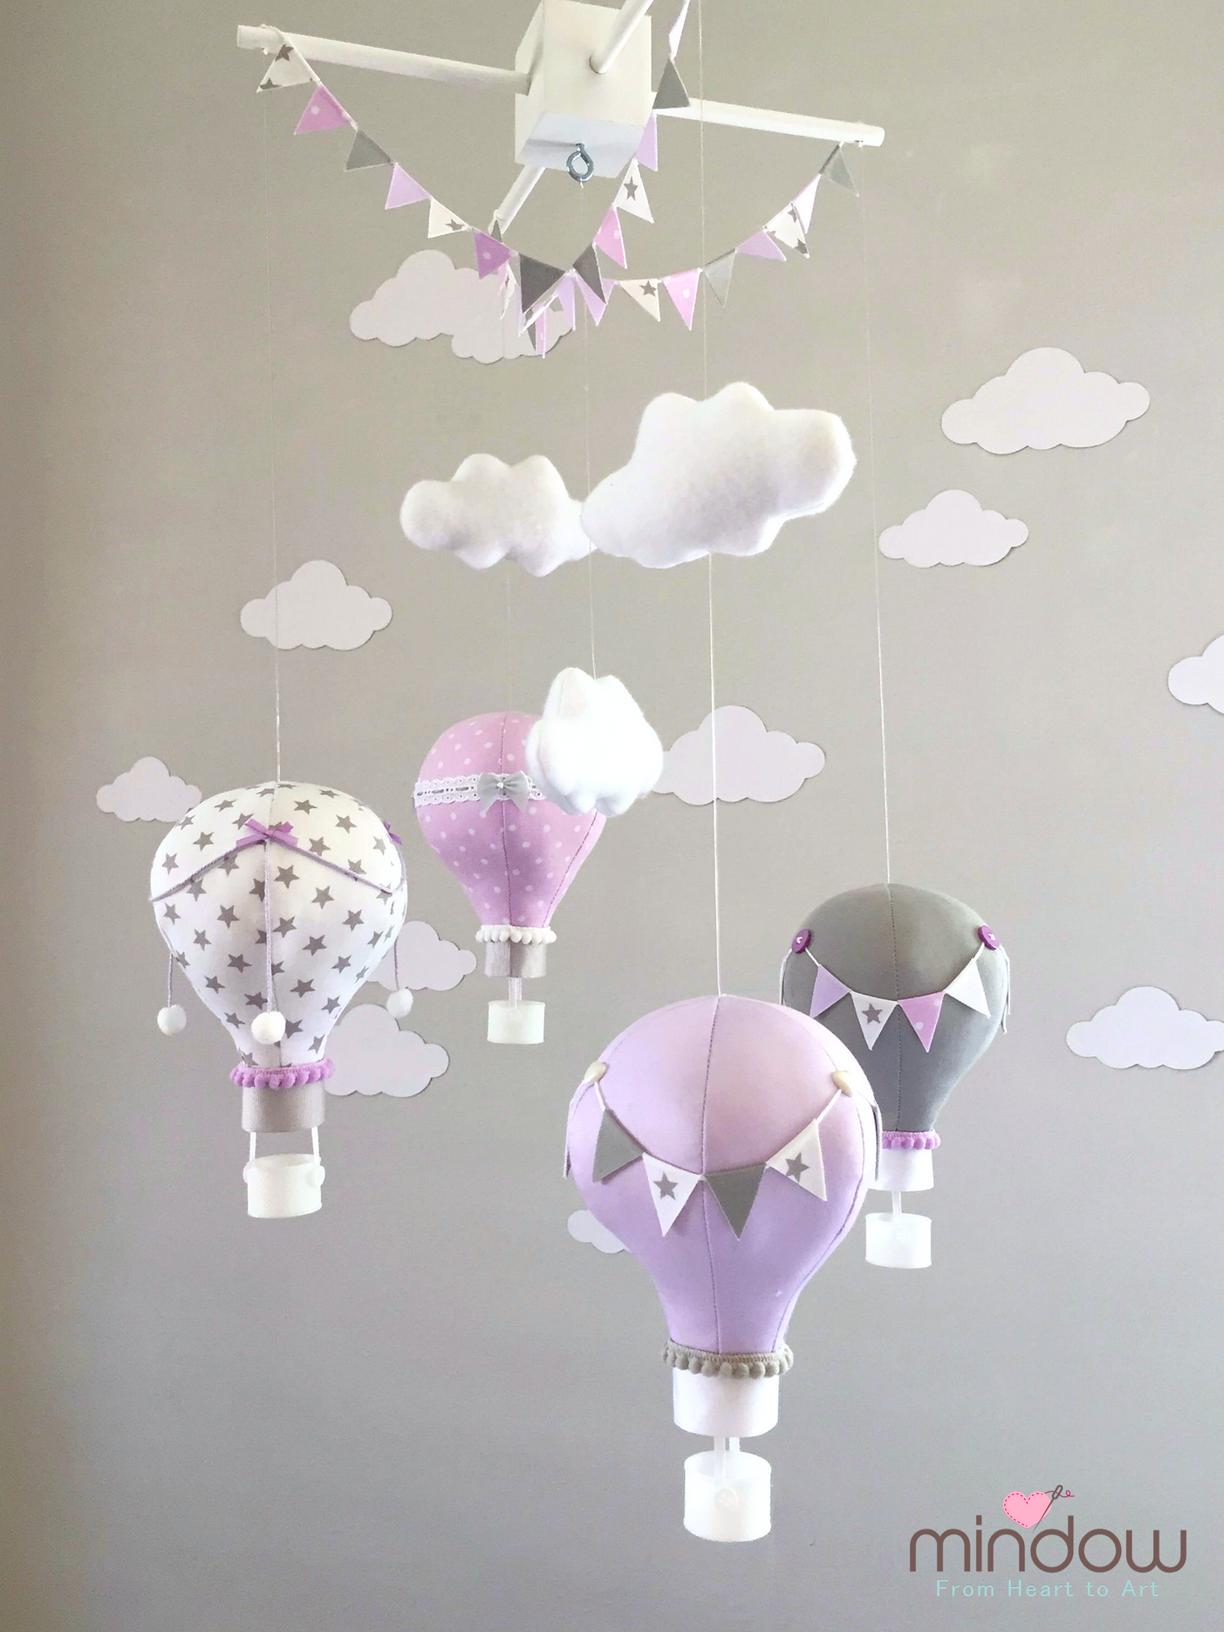 Hot air balloon mobile purple lavender מובייל כדורים